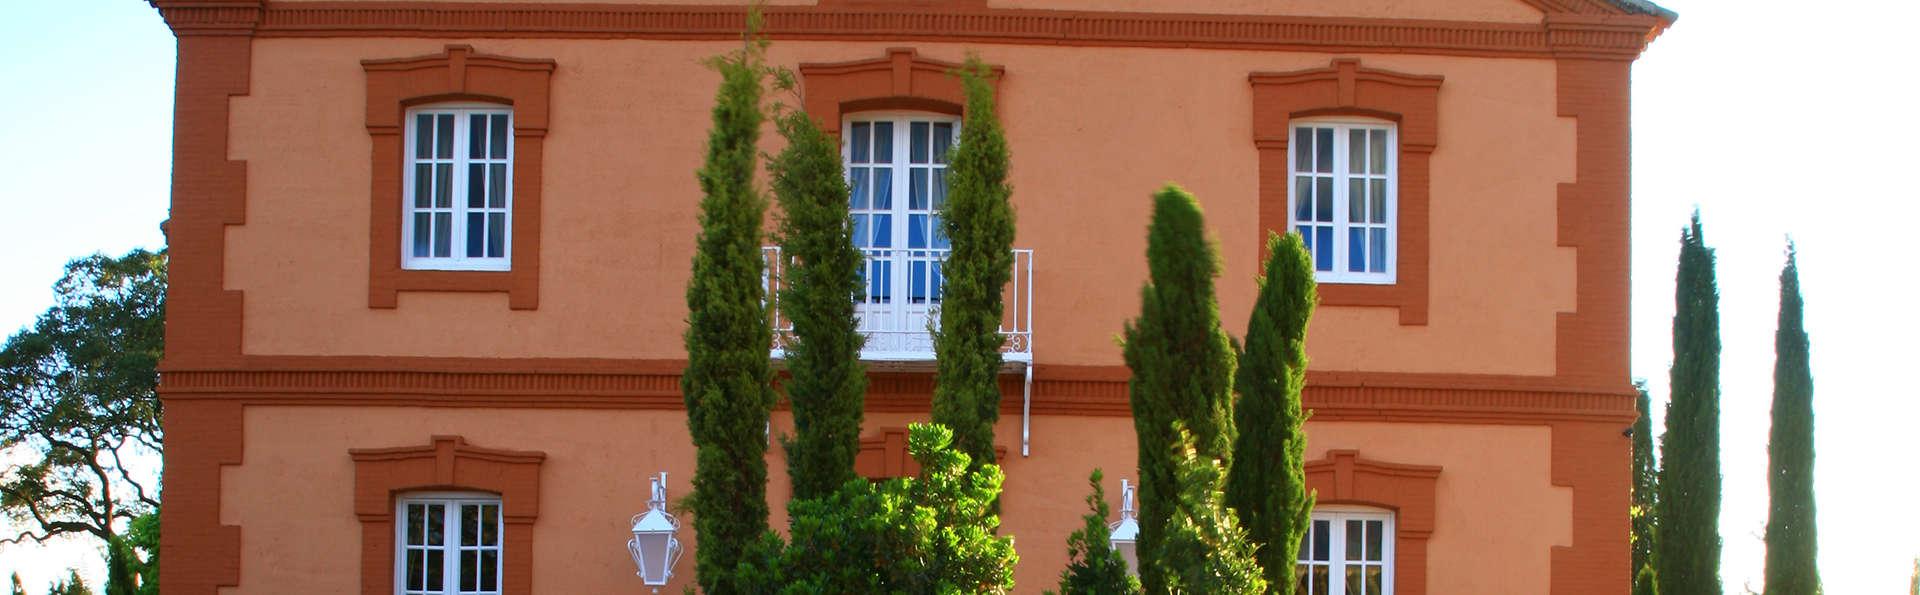 Hotel Valdepalacios Gourmand 5* GL - edit_facade2.jpg